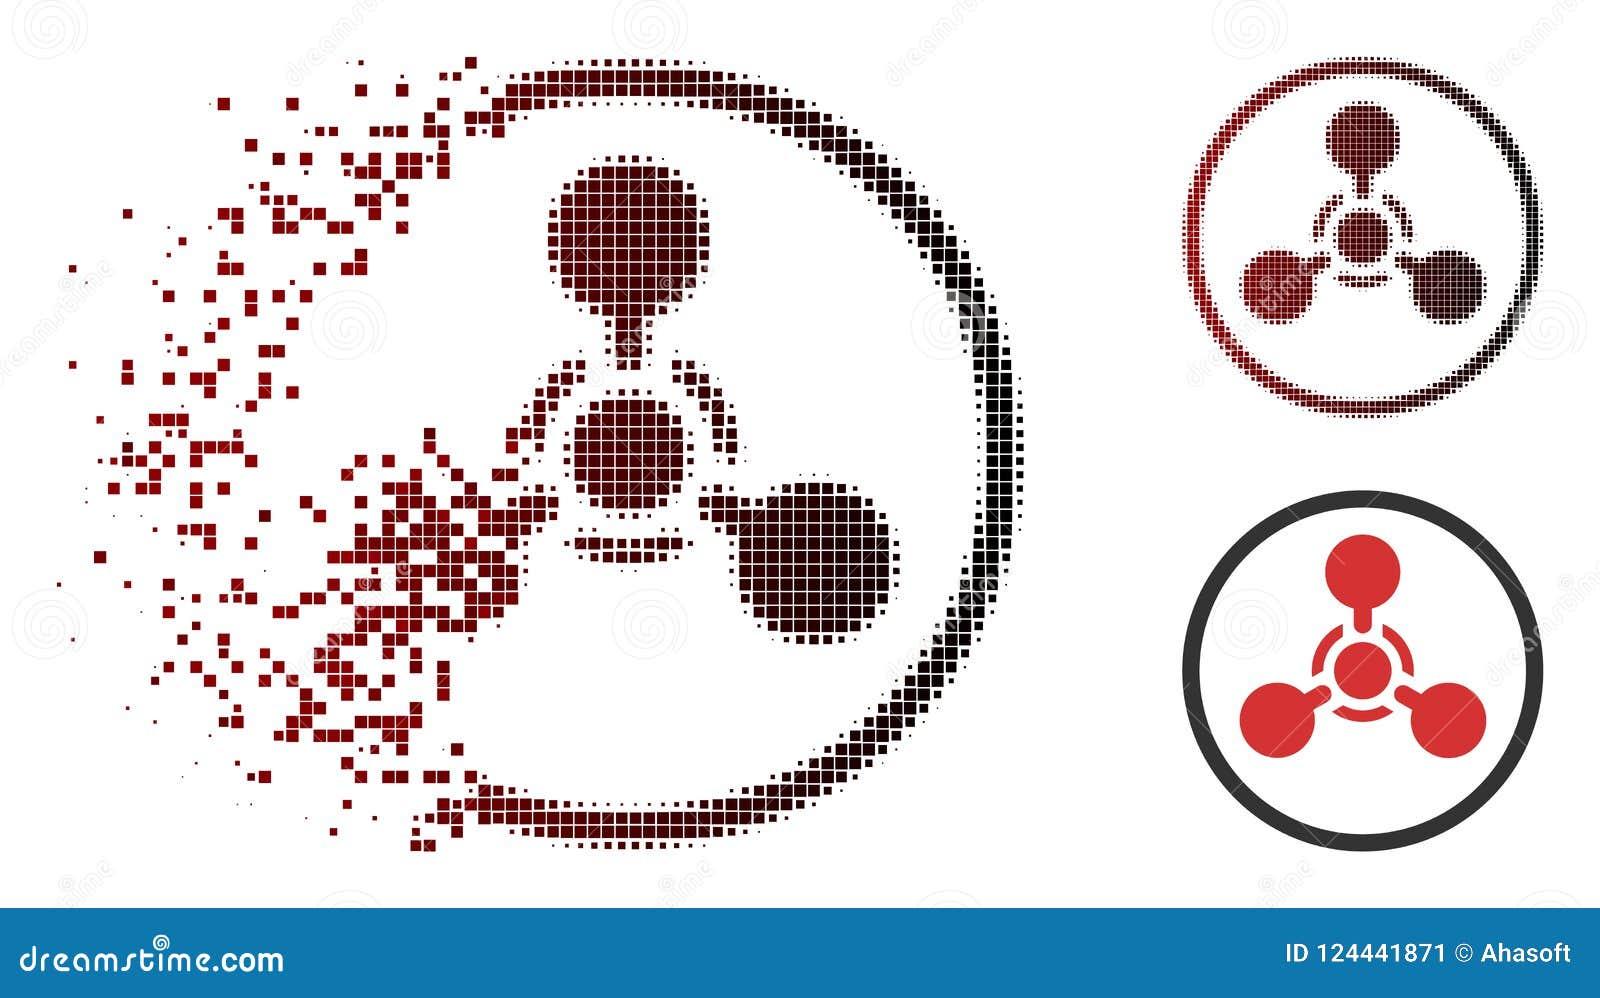 Agente de nervio de semitono quebrado de Pixelated WMD Chemical Warfare Icon